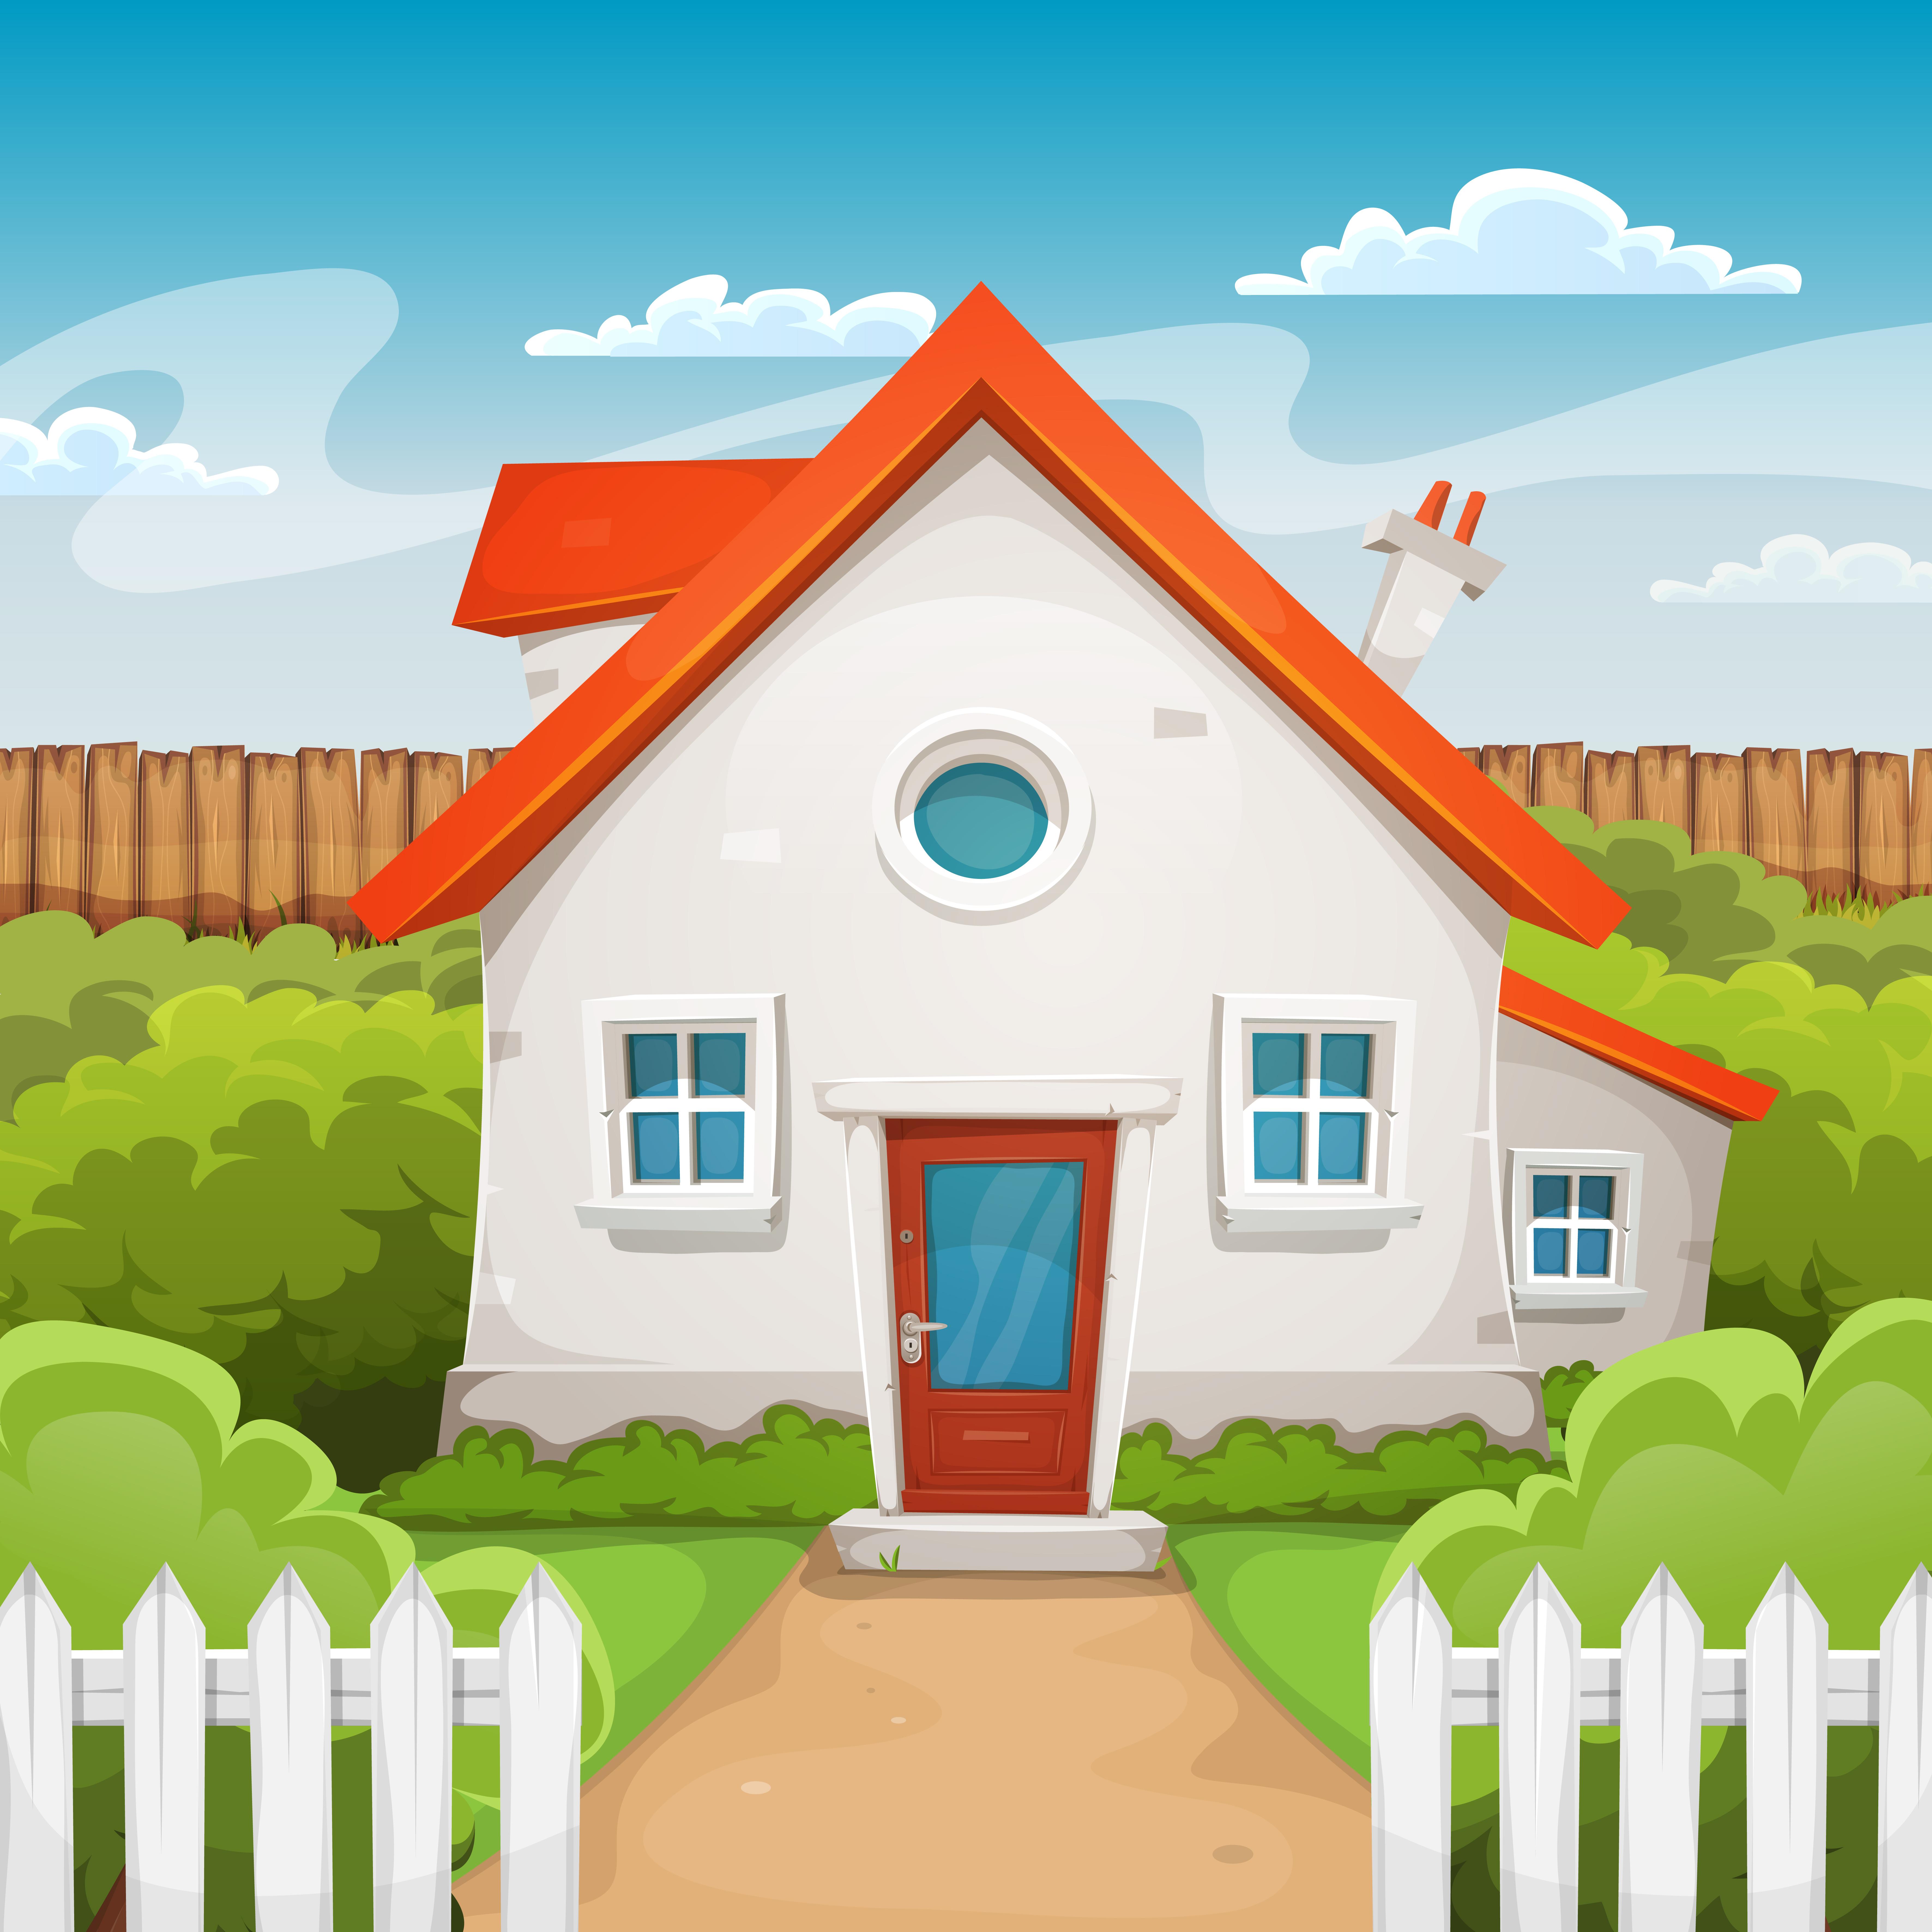 House Inside Garden - Download Free Vectors, Clipart ...